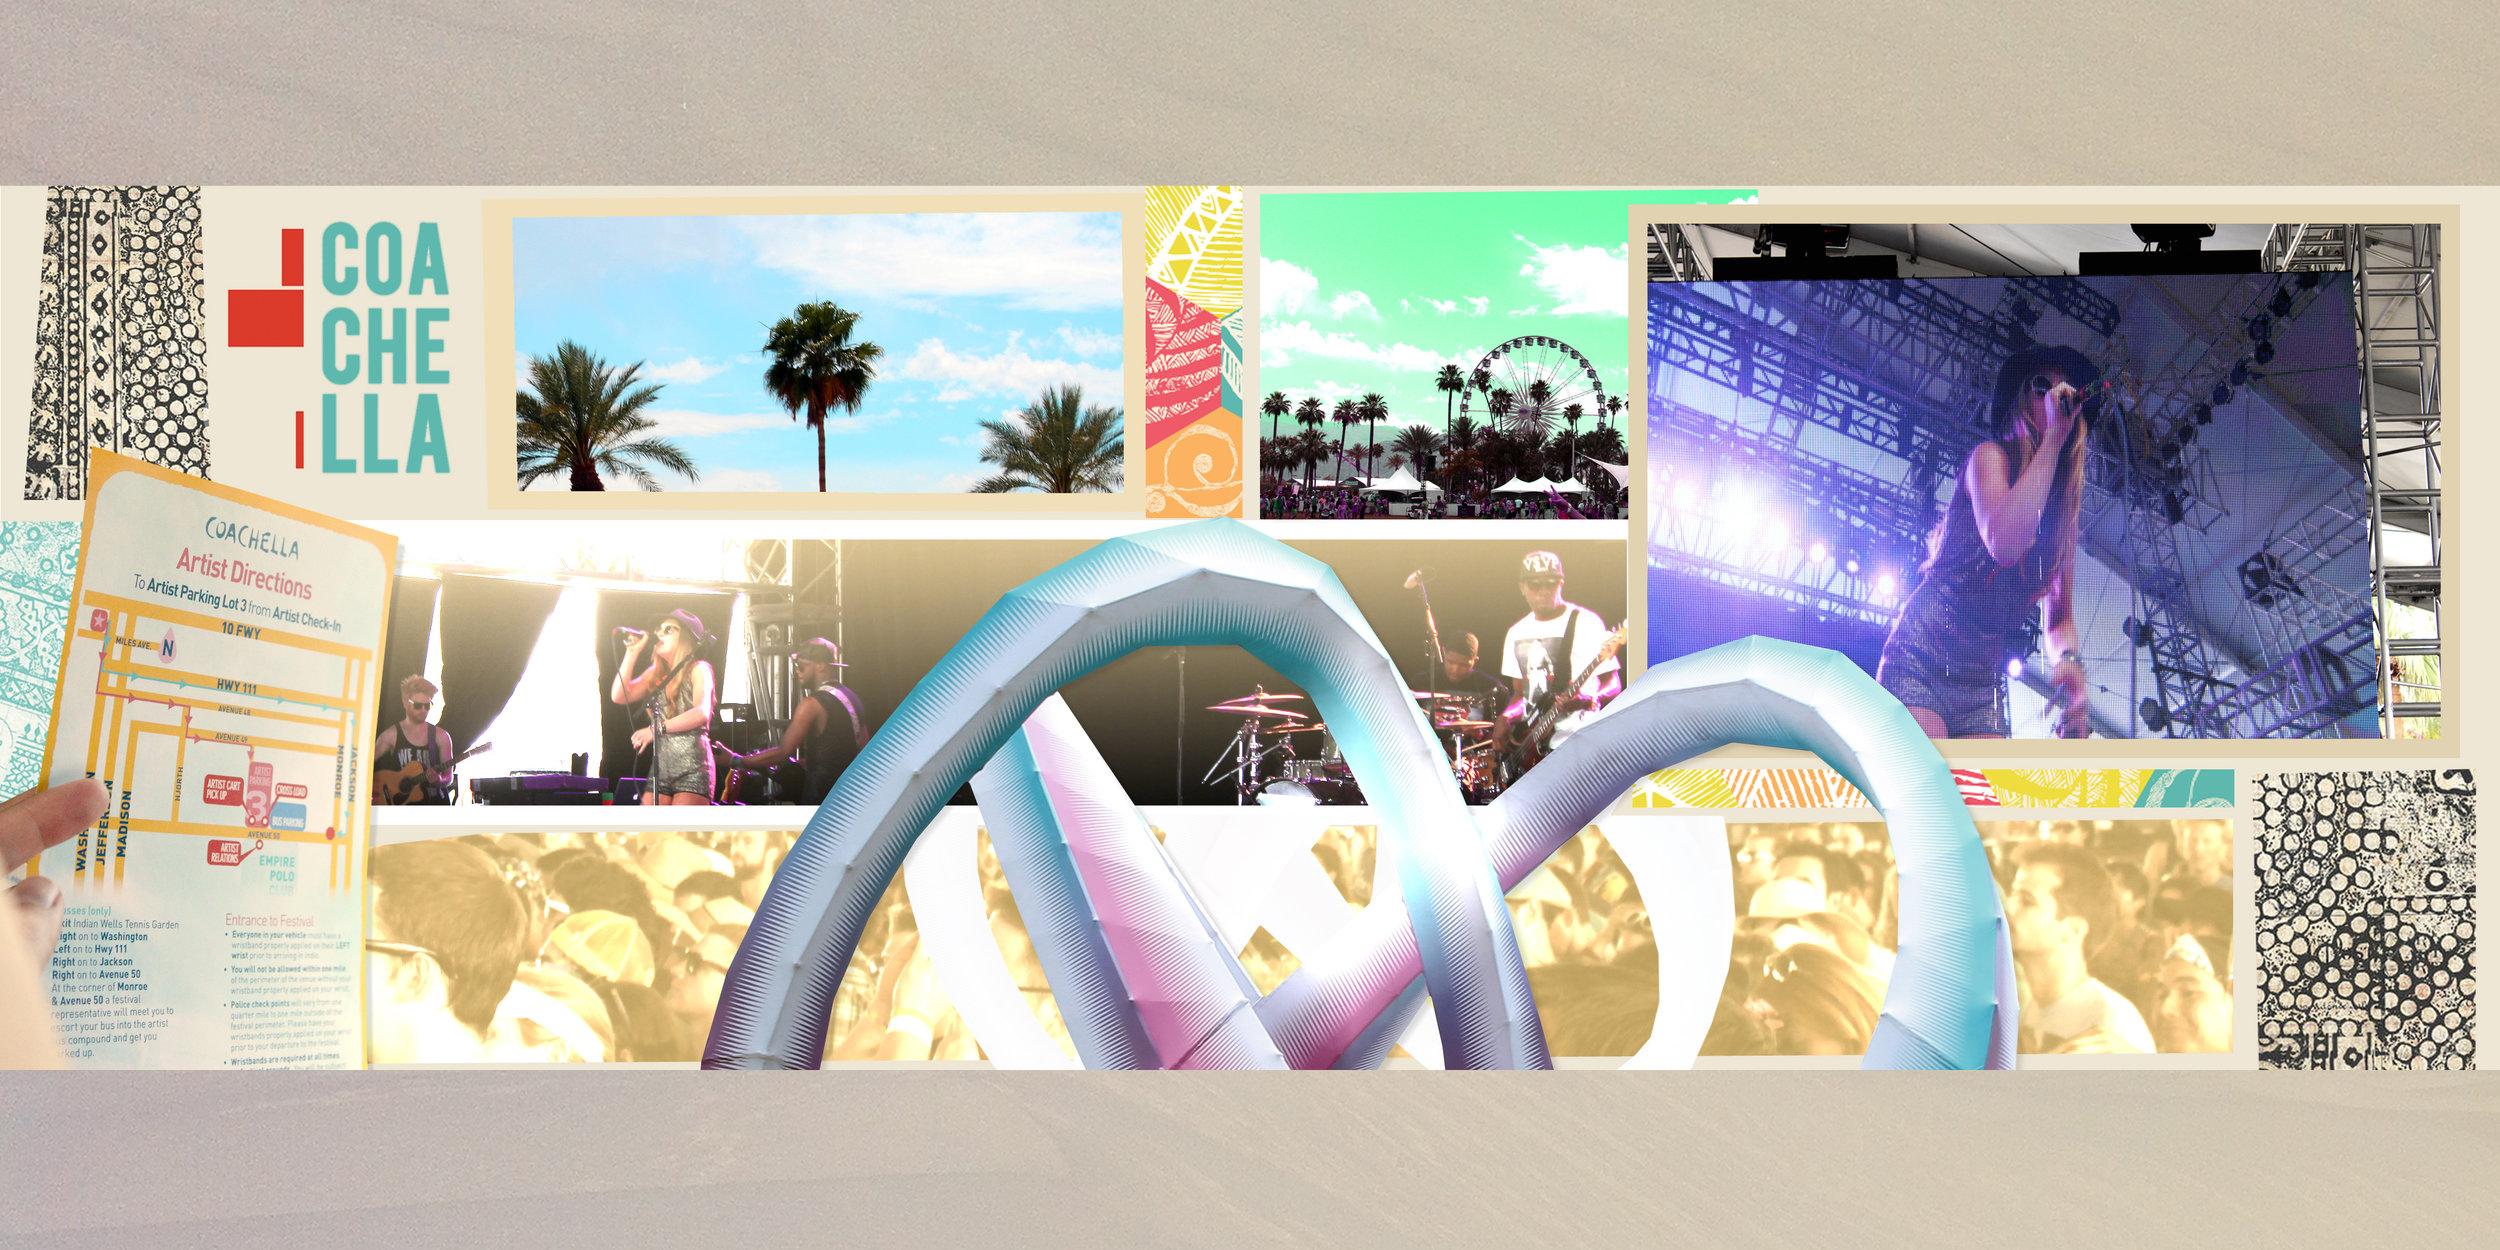 Coachella Image 3